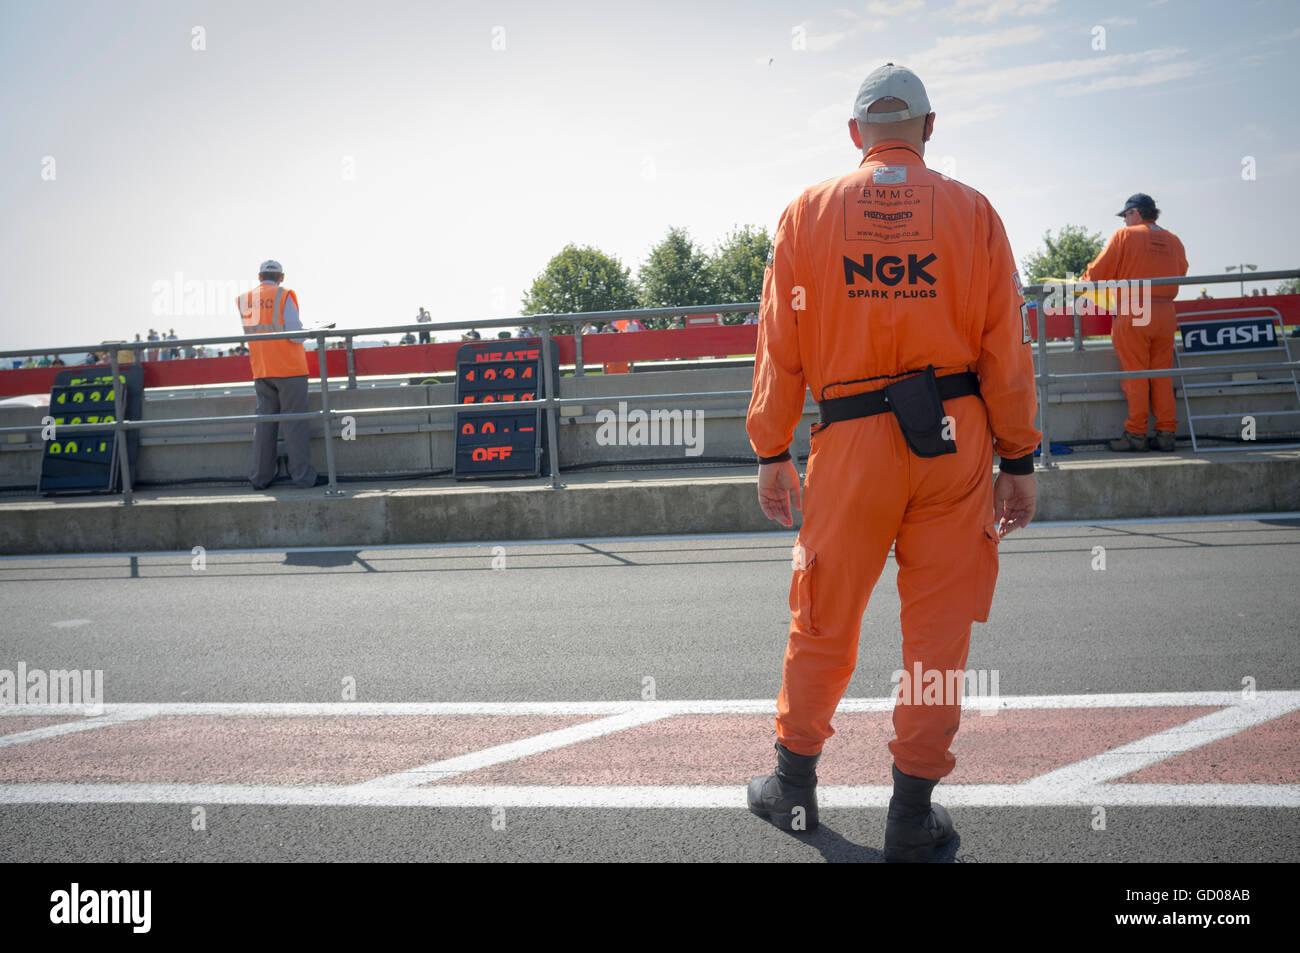 Track marshalls at Silverstone - Stock Image